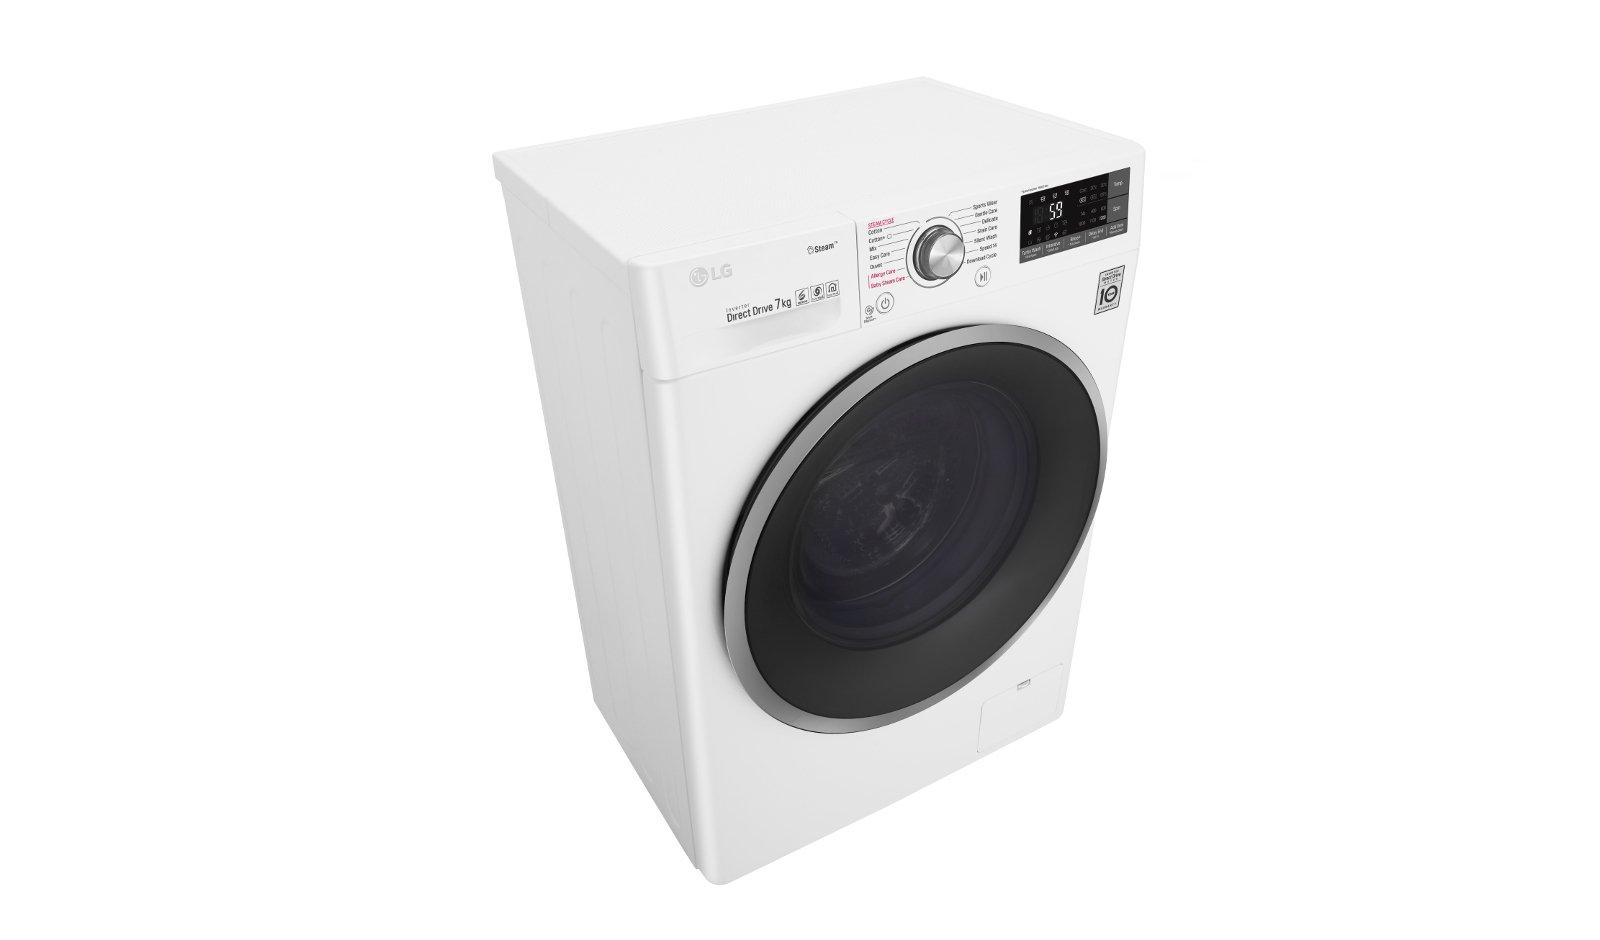 LG-f2j7hy1-W-autonome-Belastung-Bevor-7-kg-1200trmin-A-Wei-Waschmaschine-Waschmaschinen-autonome-bevor-Belastung-wei-Knpfe-drehbar-links-150-